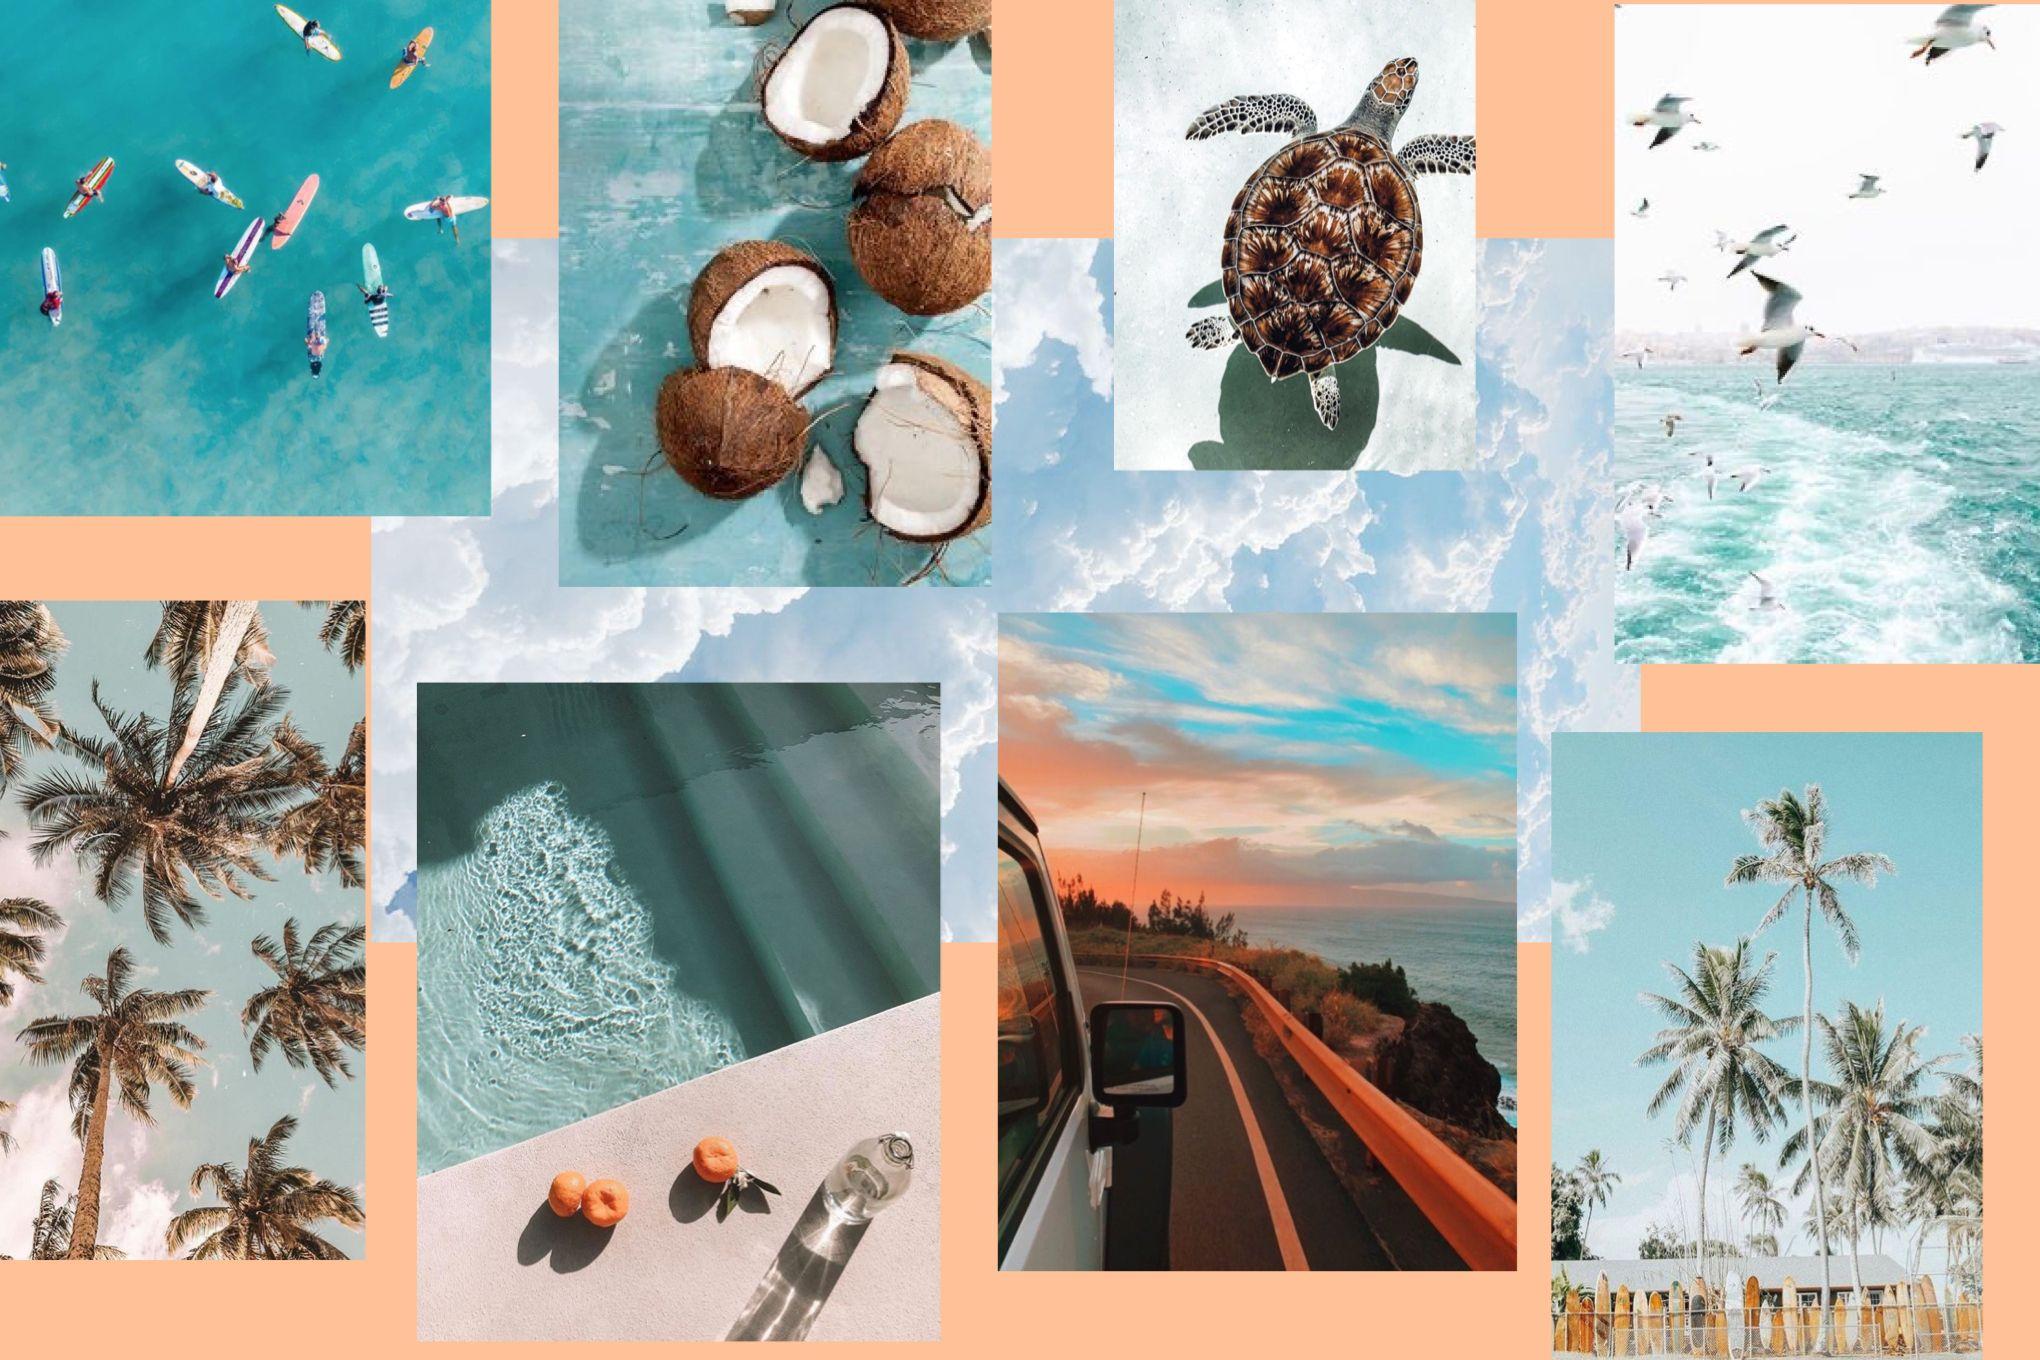 Beach Vibes Macbook Wallpaper Macbook Wallpaper Wallpapers Summer Cute Background Pictures Aesthetic wallpaper beachy vibes